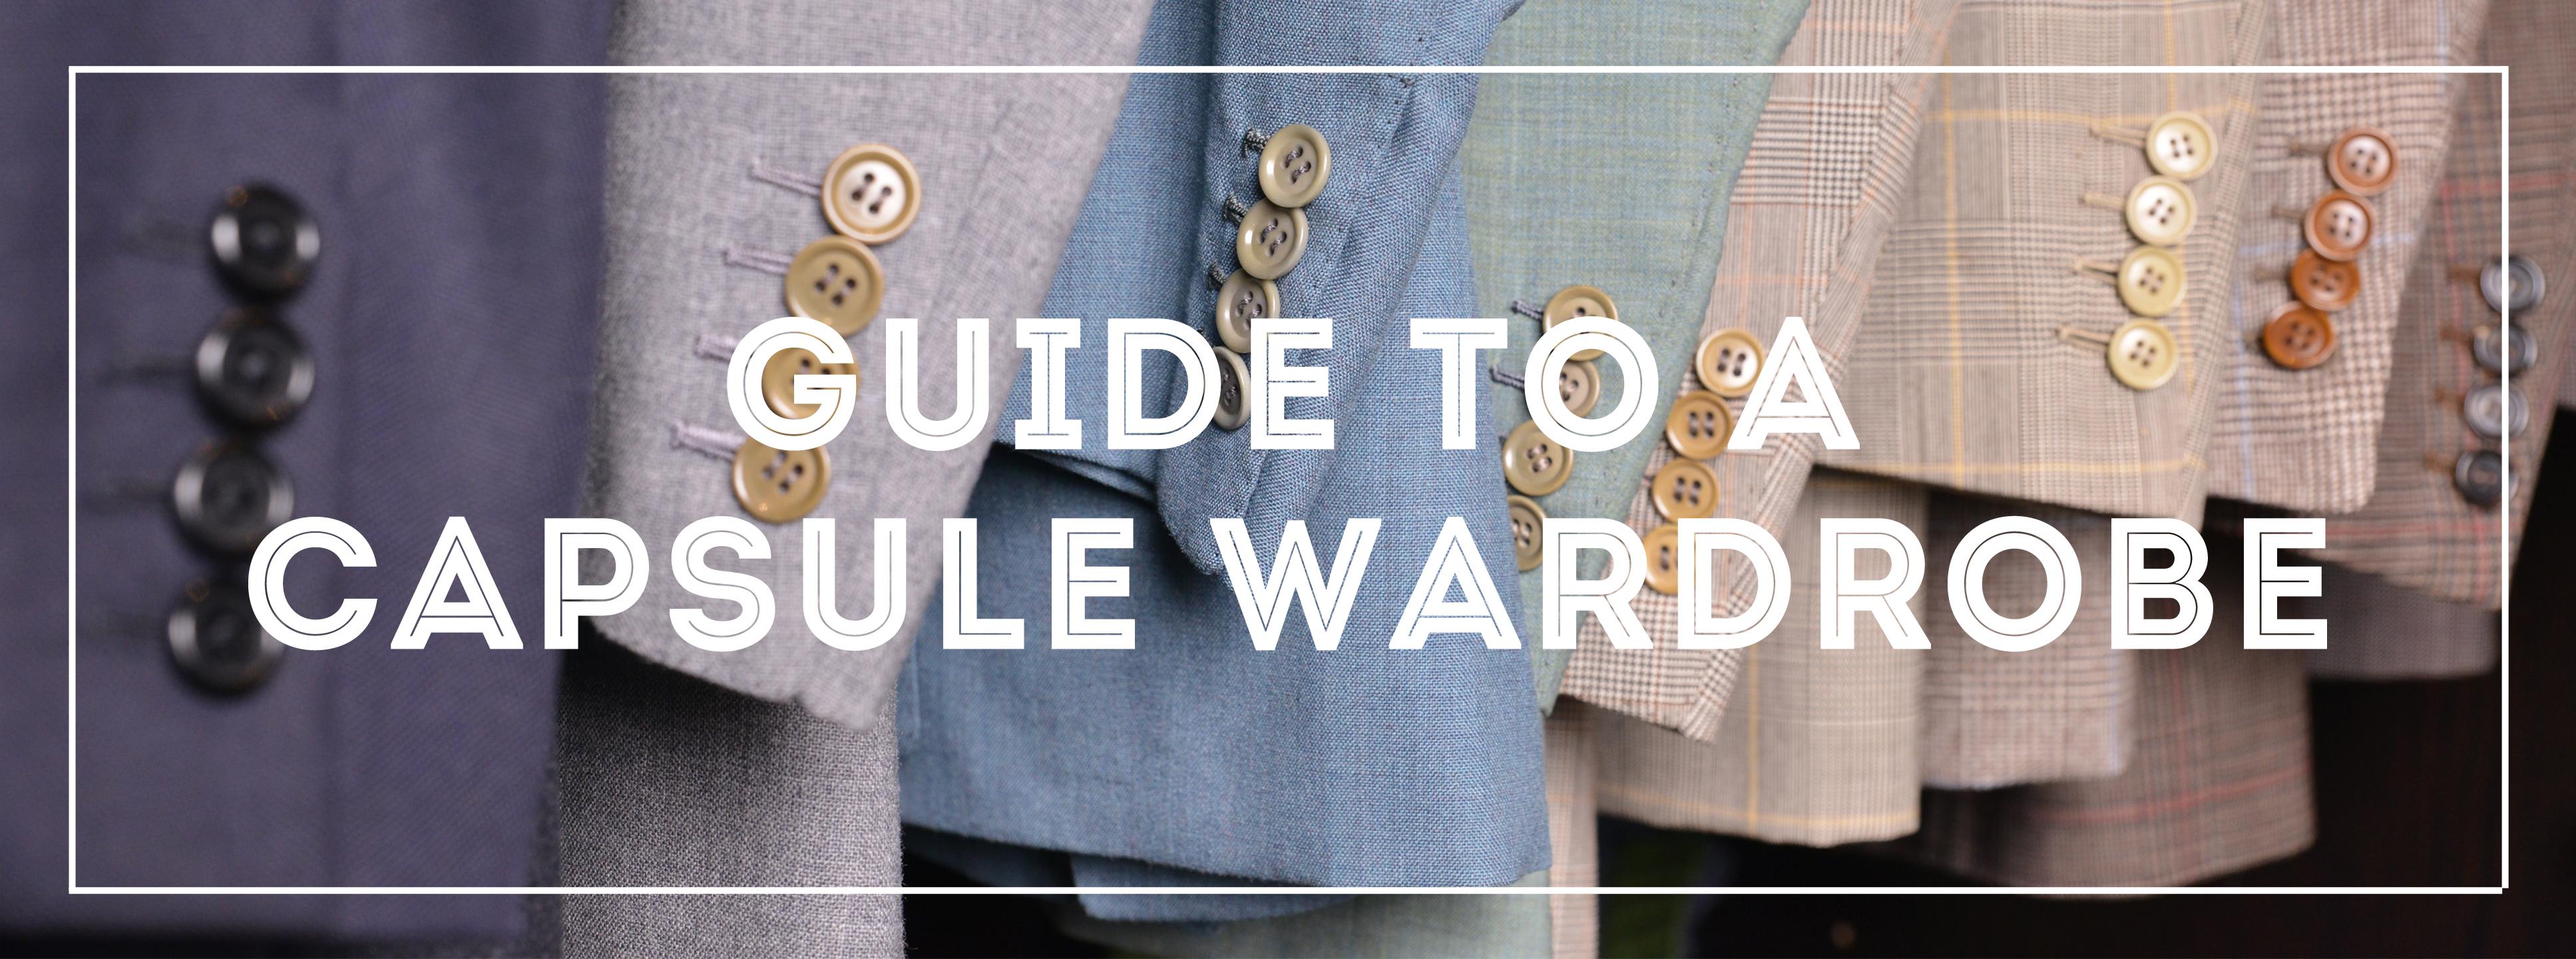 capsule wardrobe guide for men gentleman s gazette